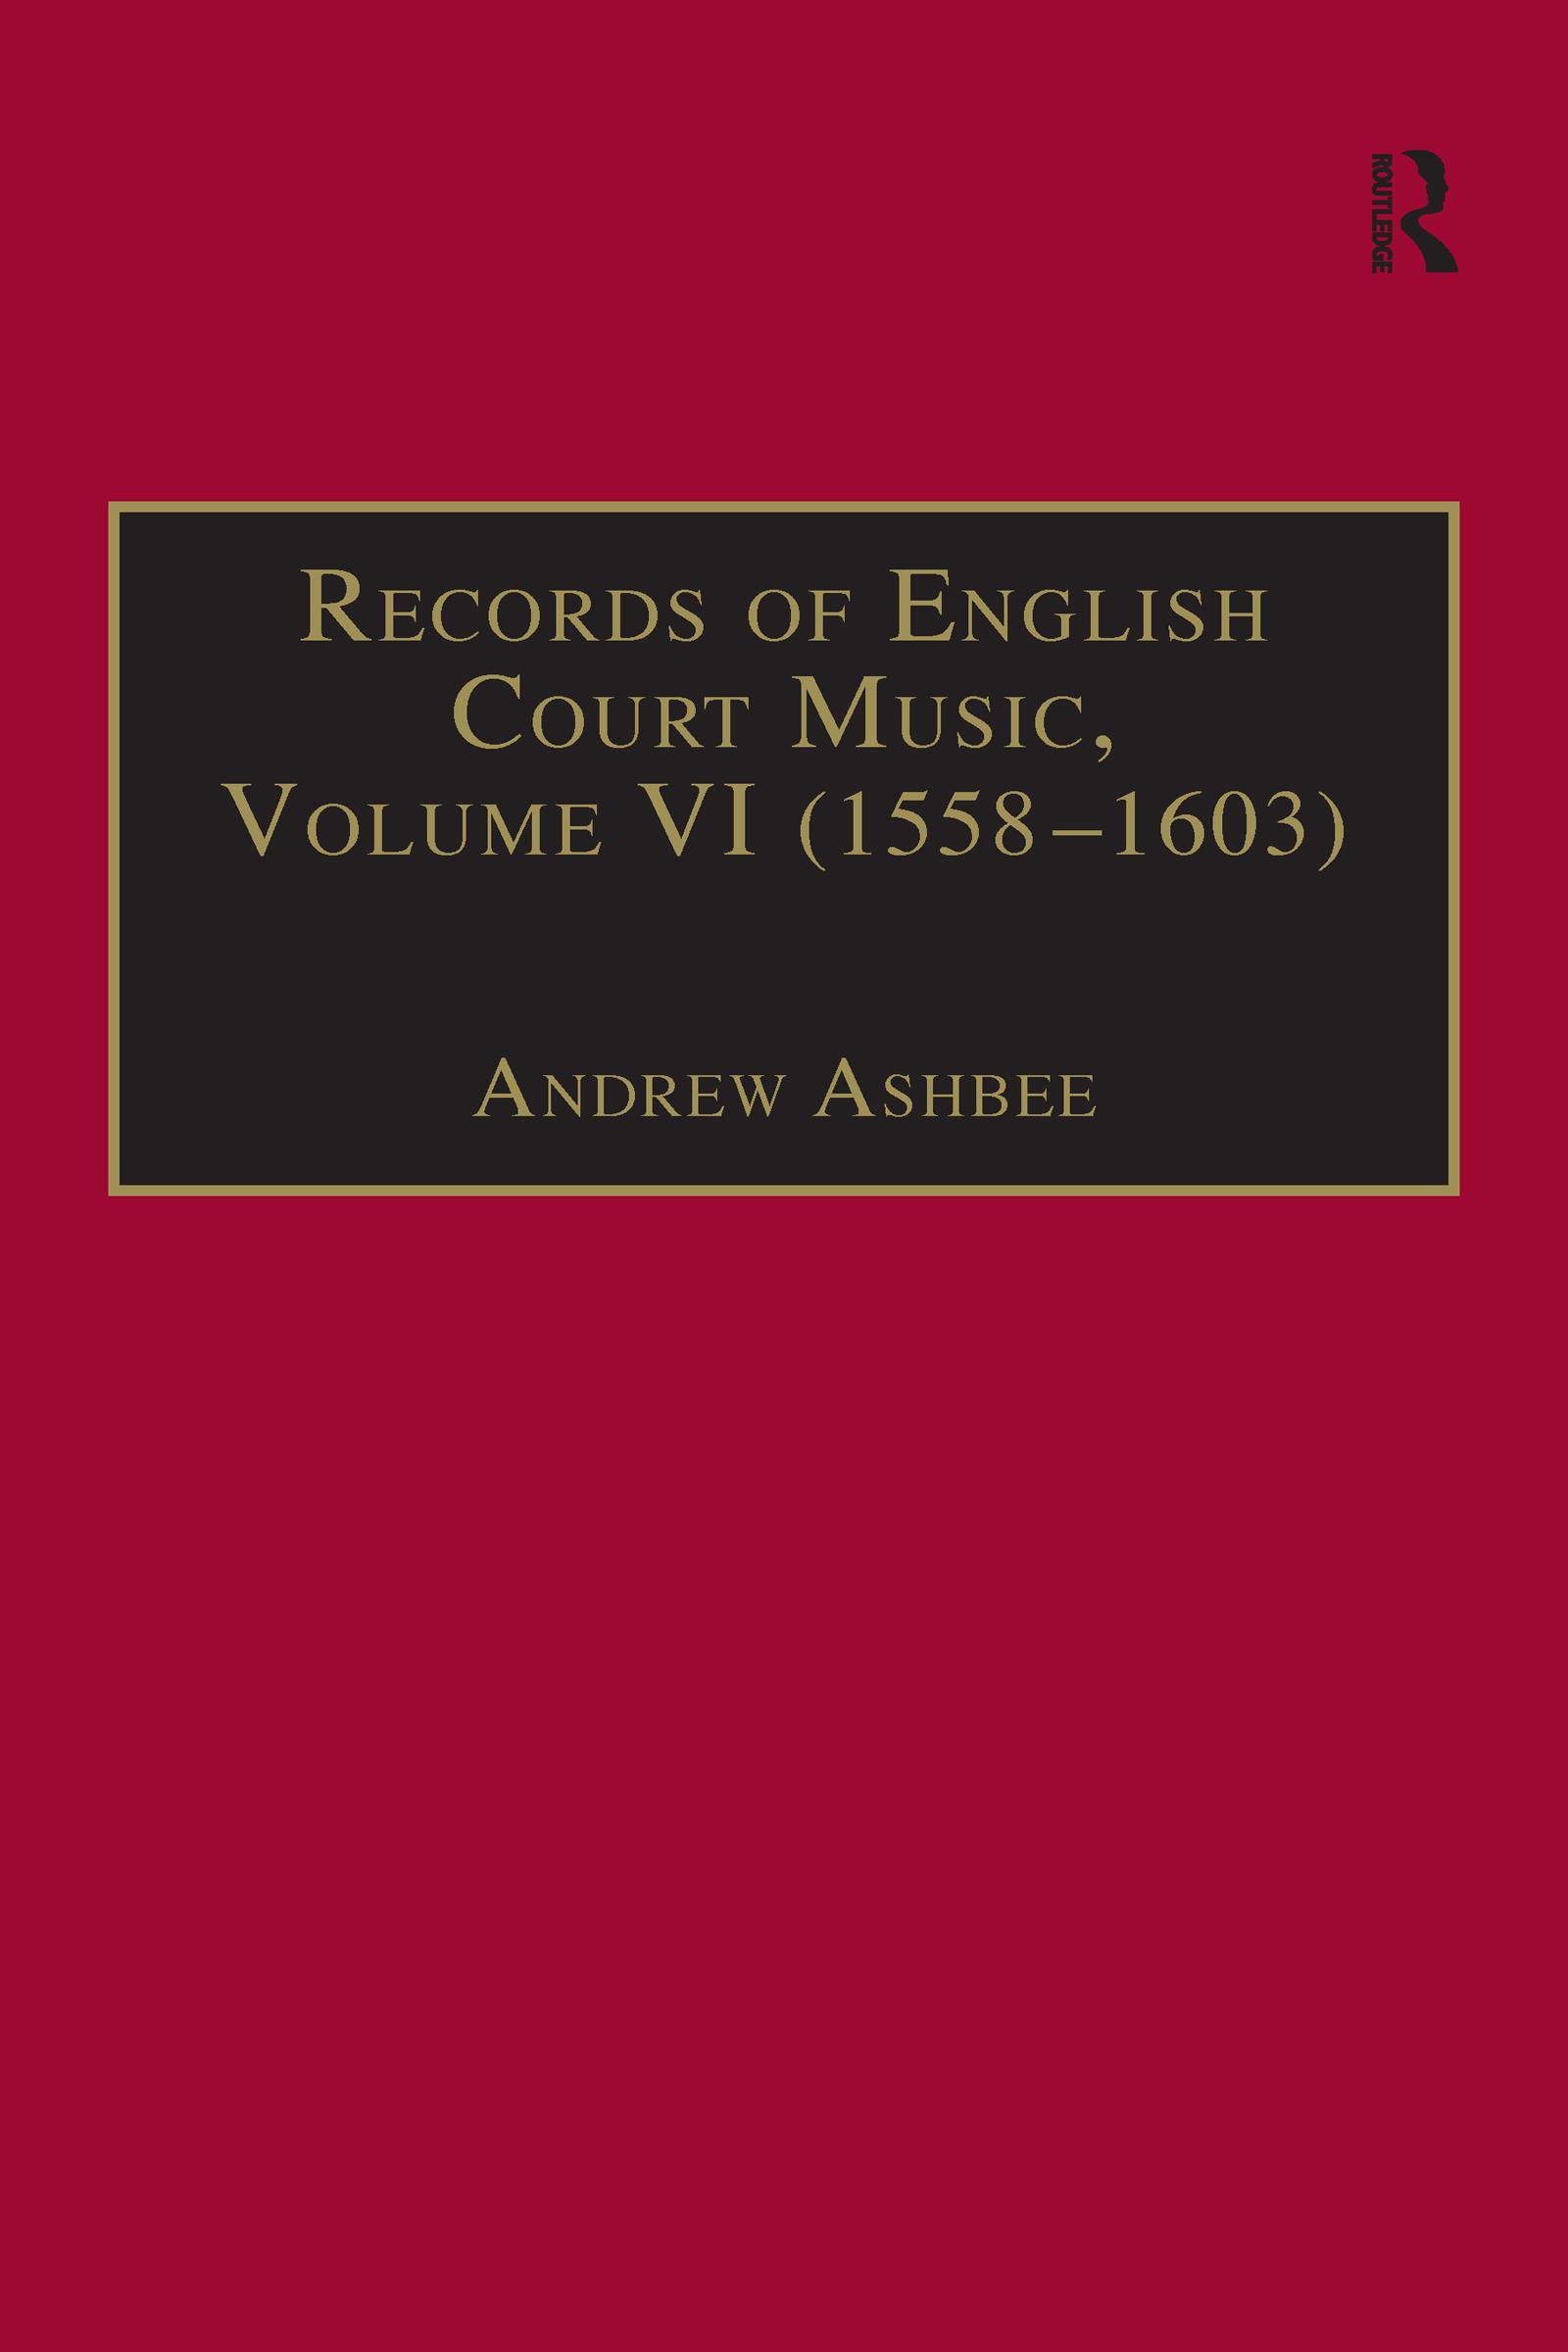 Records of English Court Music: Volume VI: 1588-1603, 1st Edition (Hardback) book cover